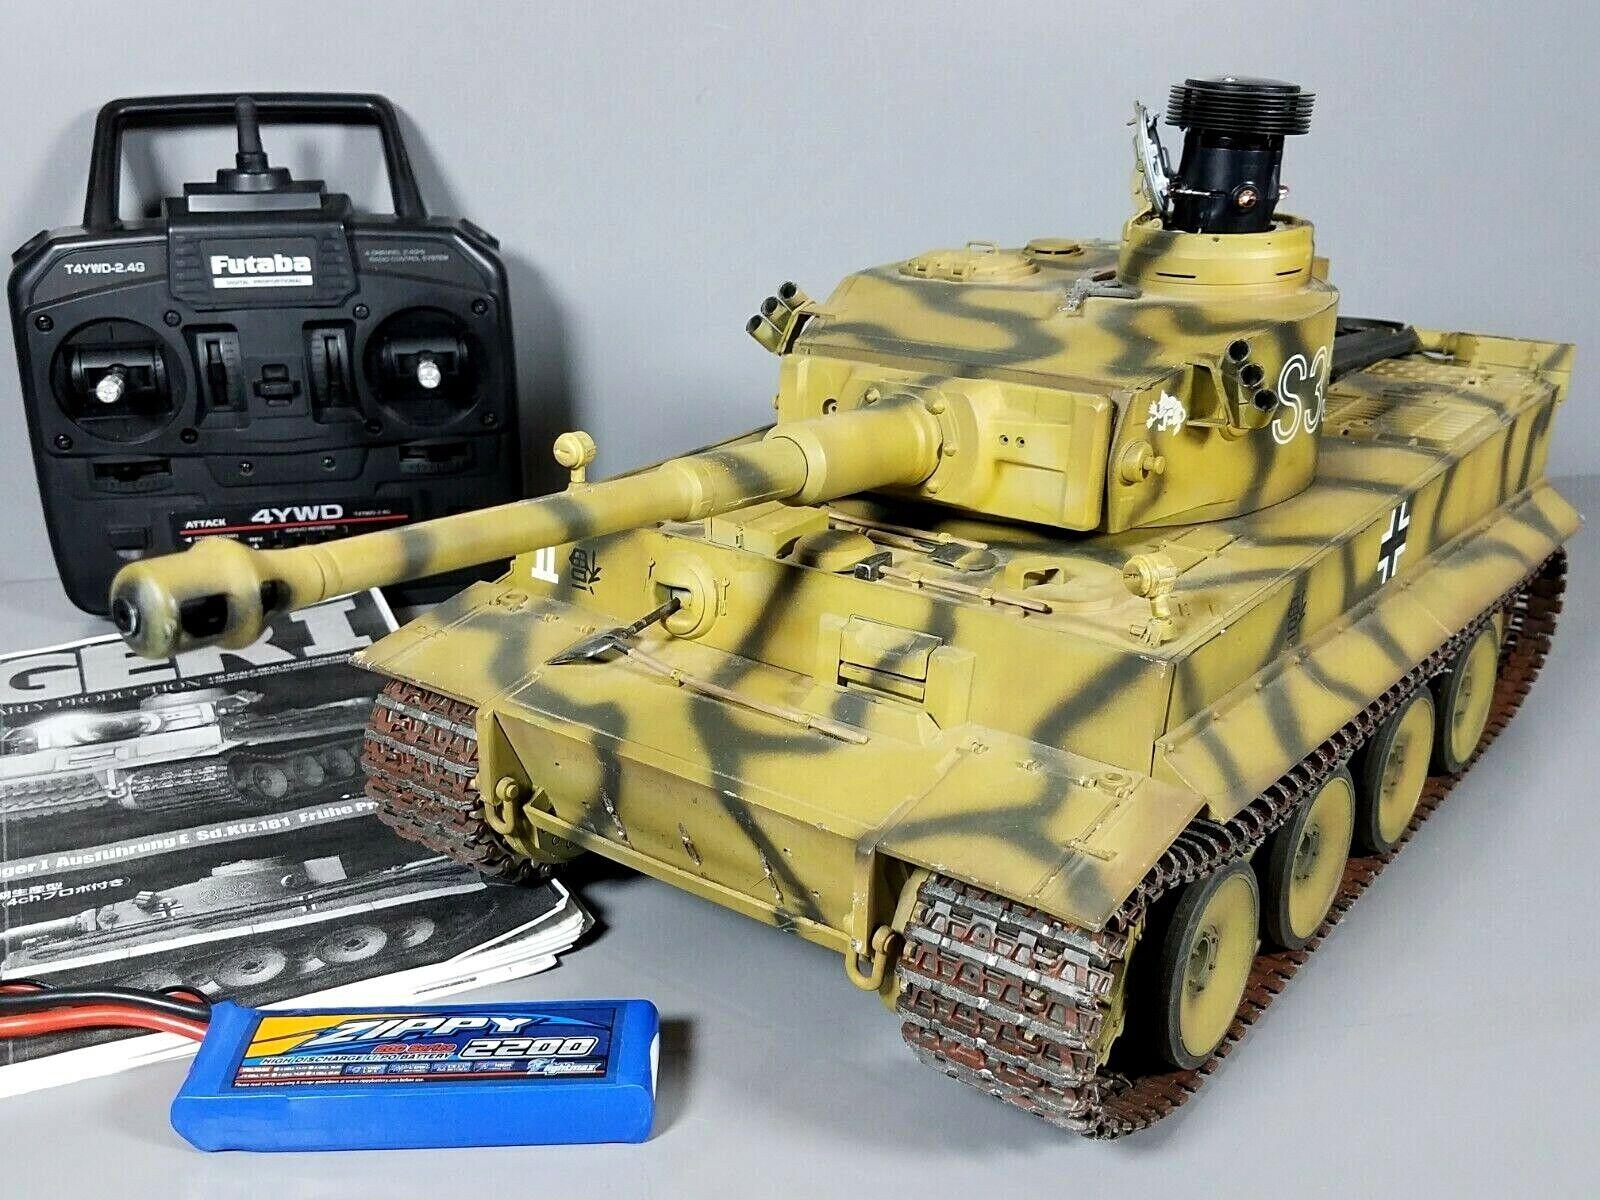 Tamiya 1 16 Tiger 1 Tank  Full Option DMD T-03 MF-01 Futaba Battery Battle System  Miglior prezzo